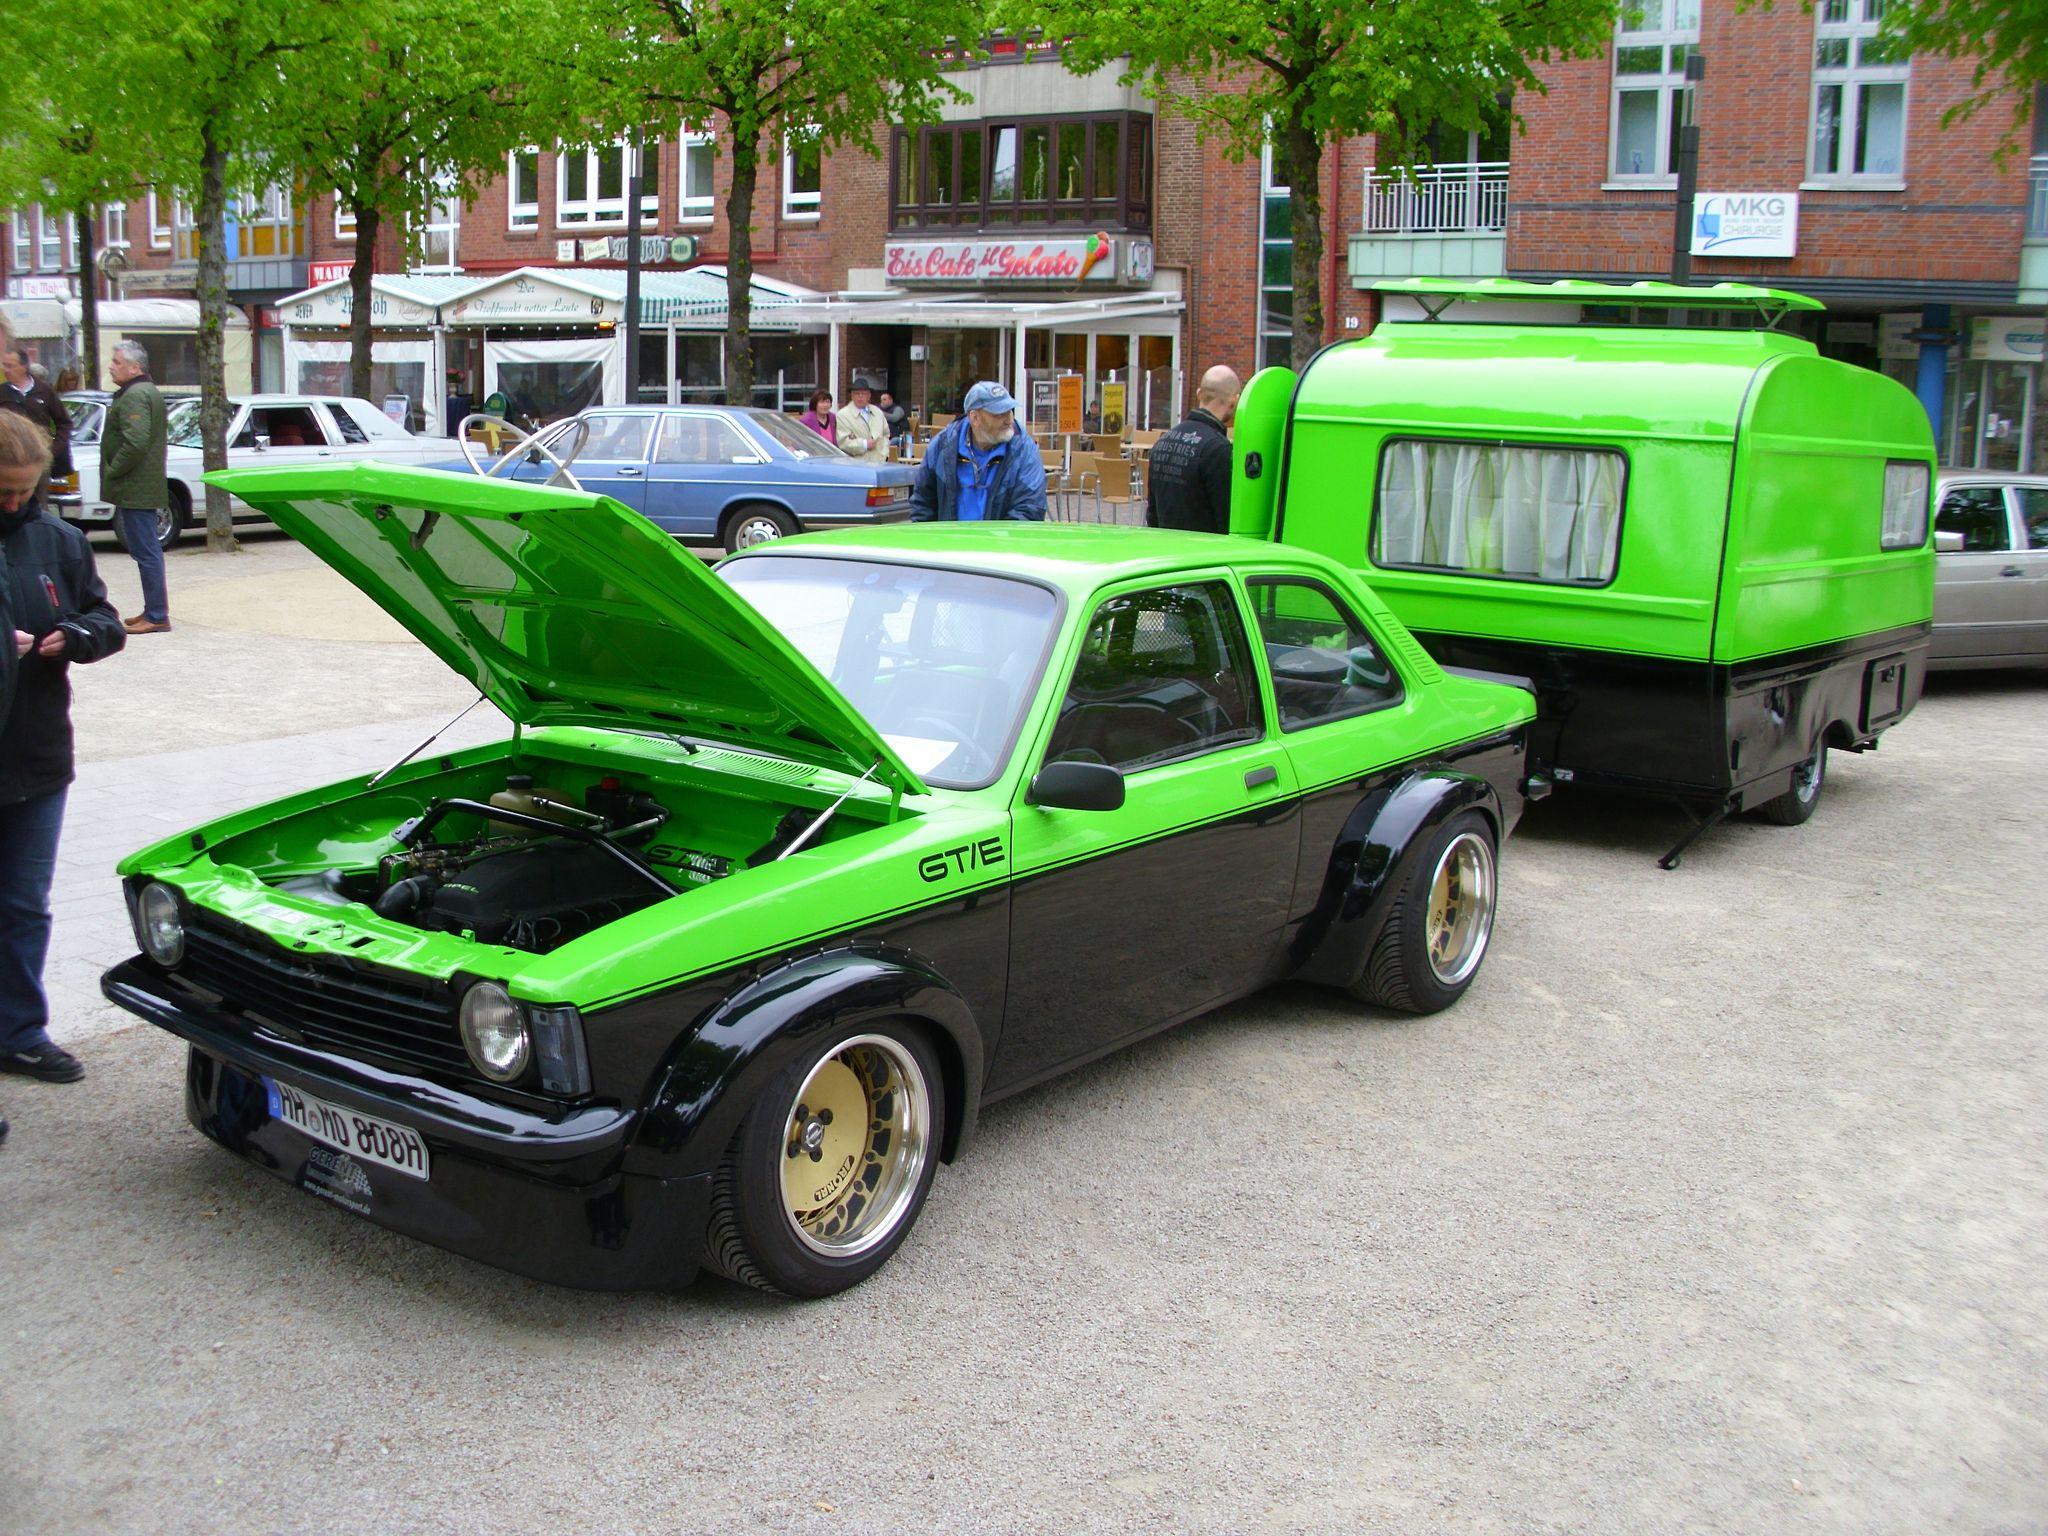 opel kadett c gt e tuning 6 retro cars chevy camaro race cars. Black Bedroom Furniture Sets. Home Design Ideas